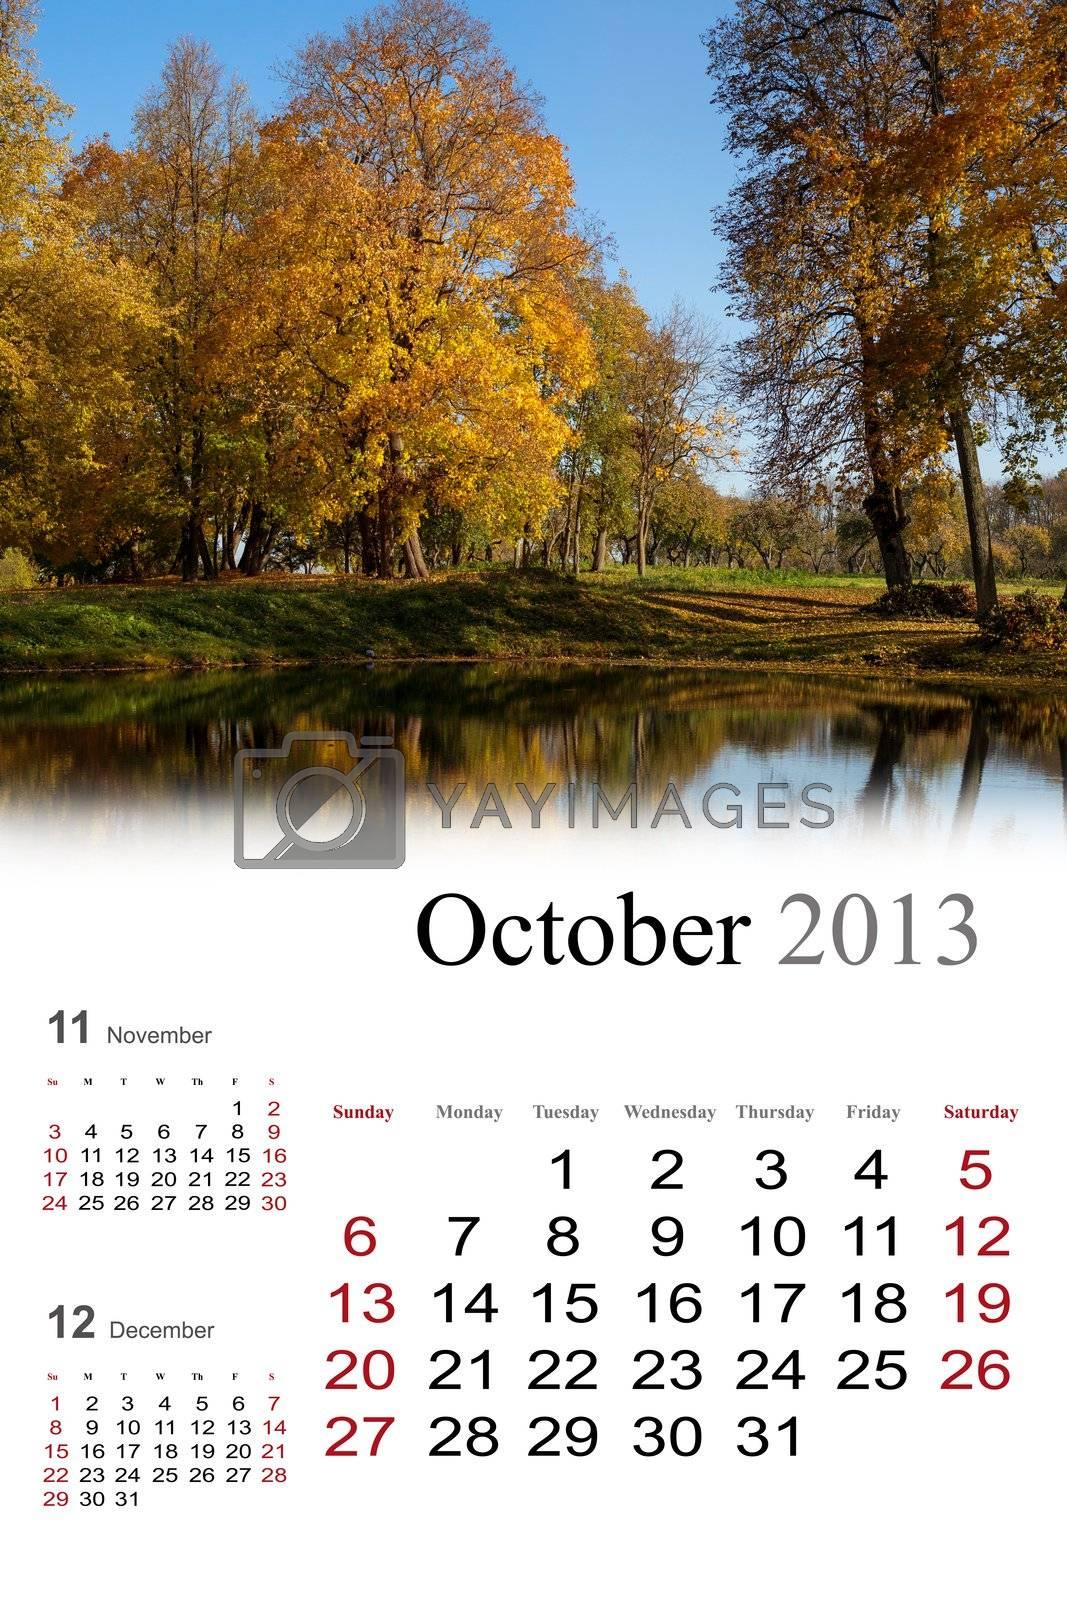 2013 Calendar. October. Golden autumn colors